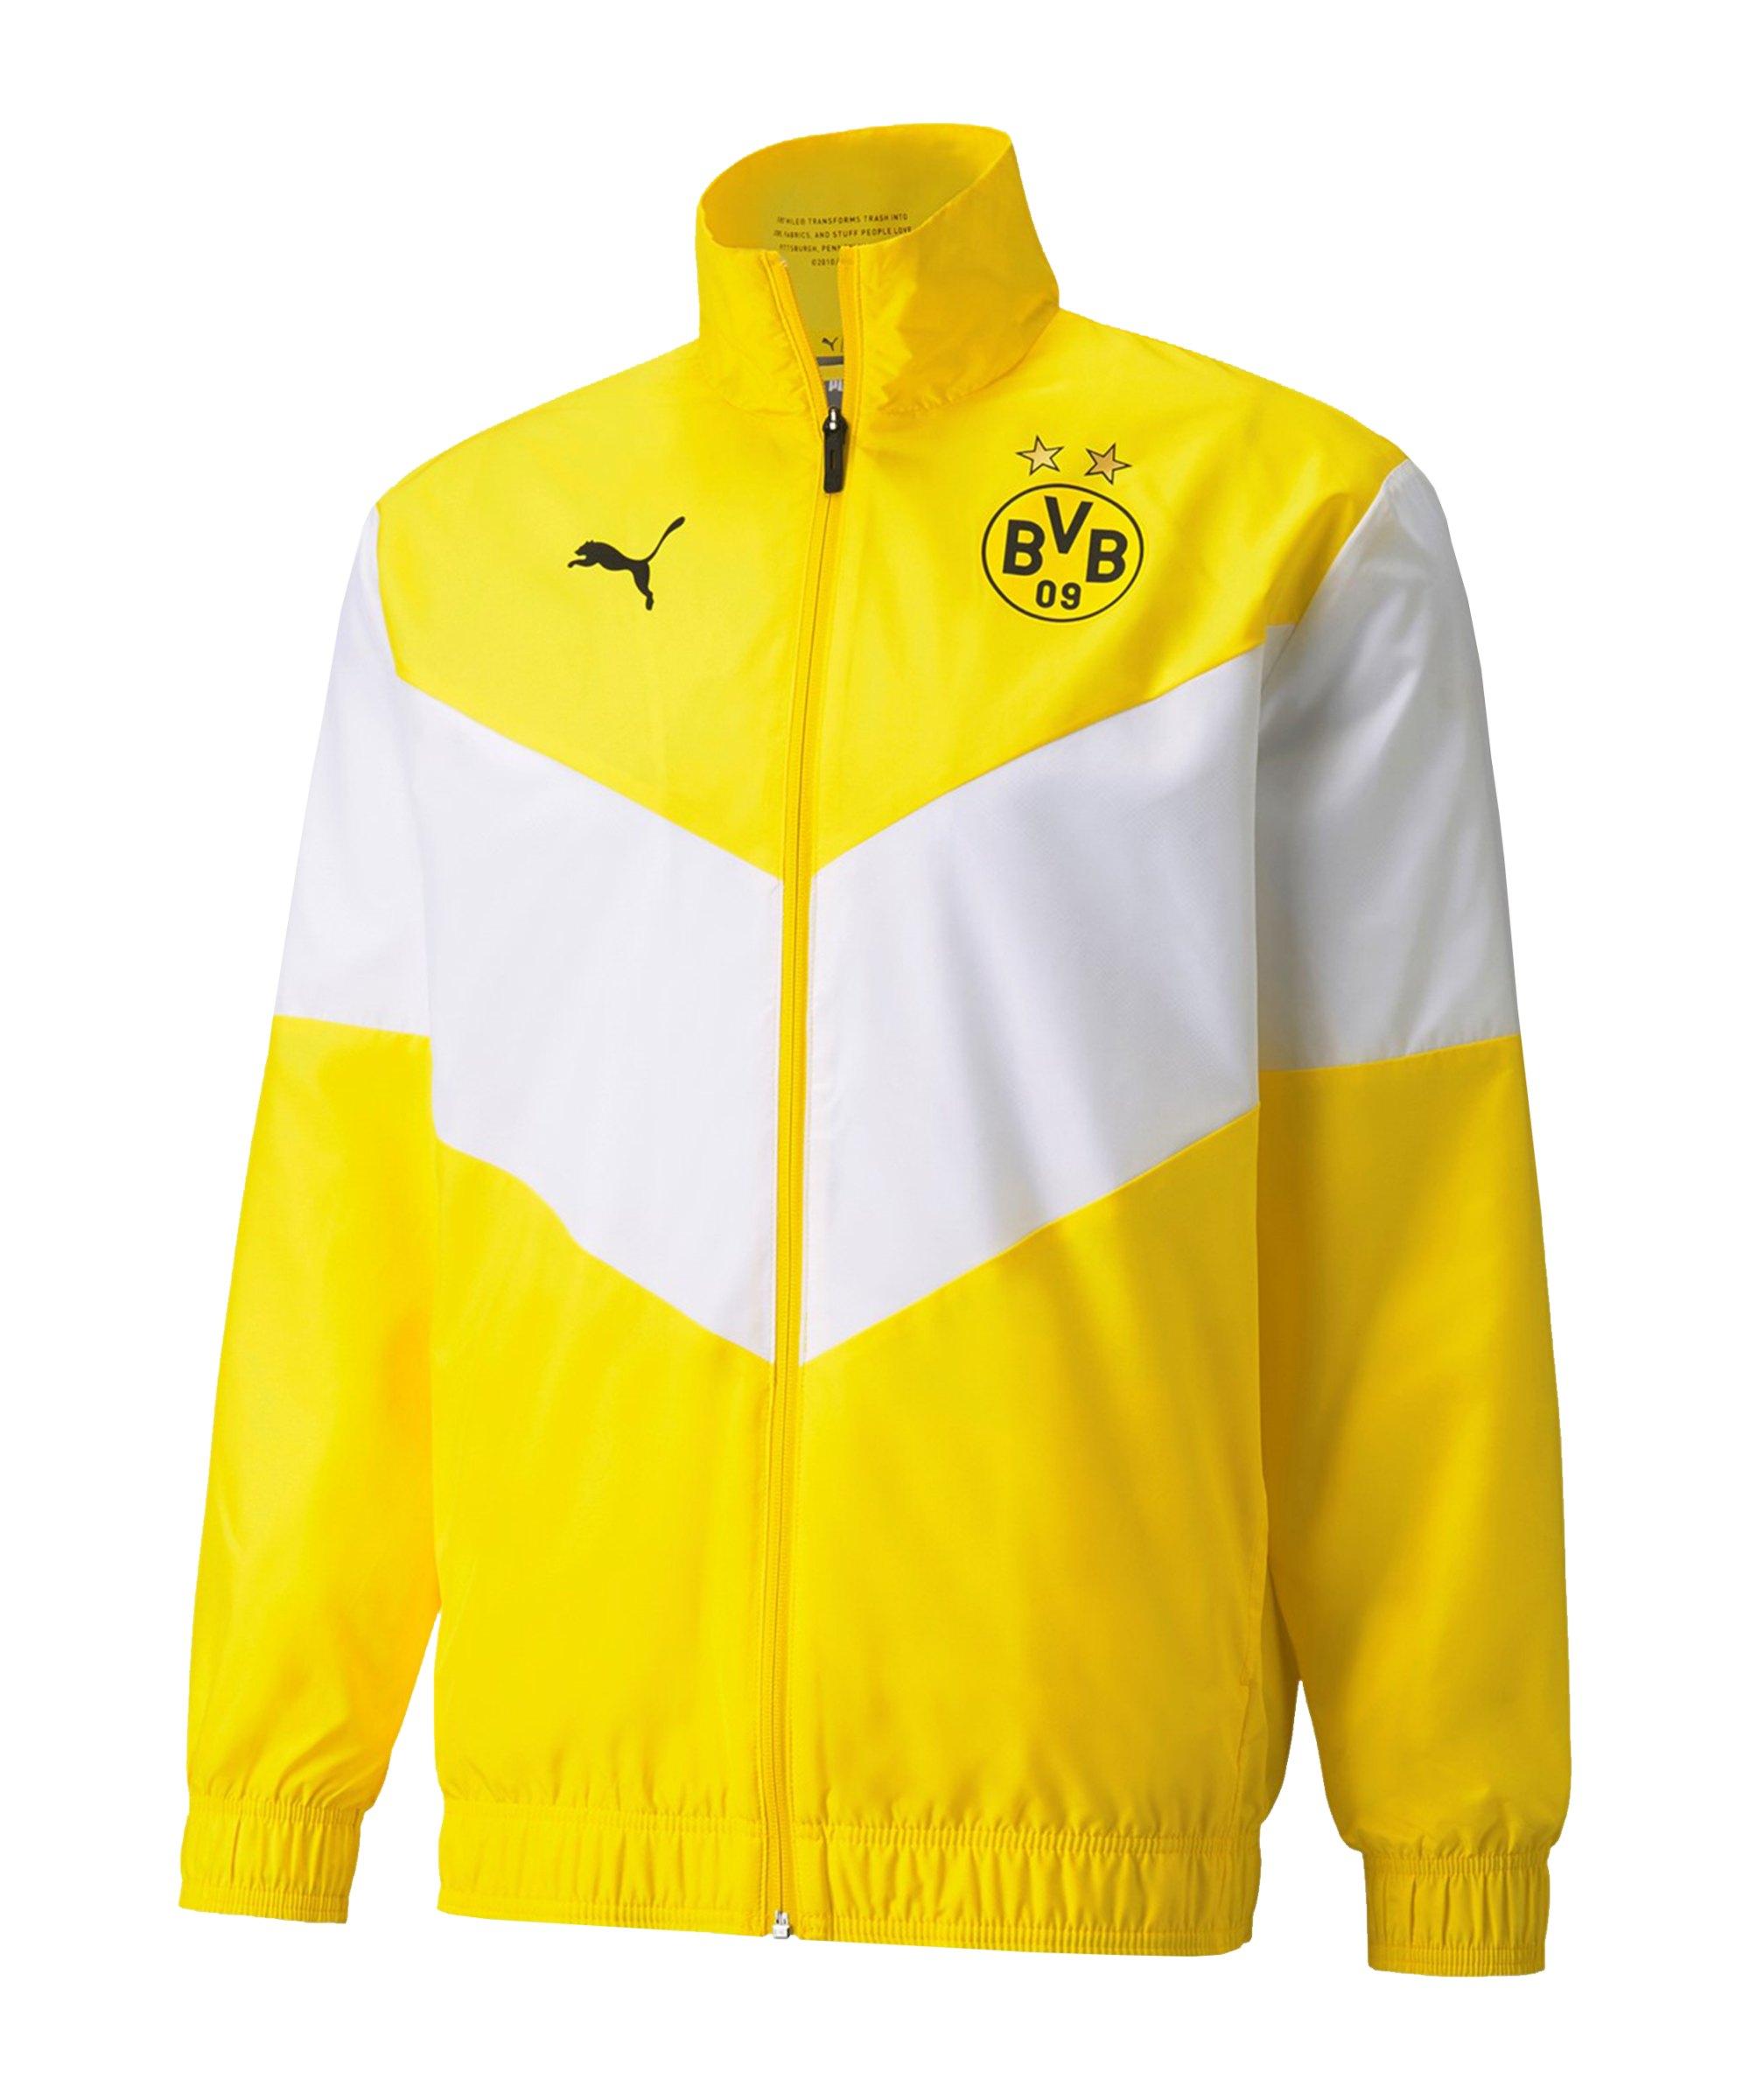 PUMA BVB Dortmund Prematch Jacke 2021/2022 F01 - gelb